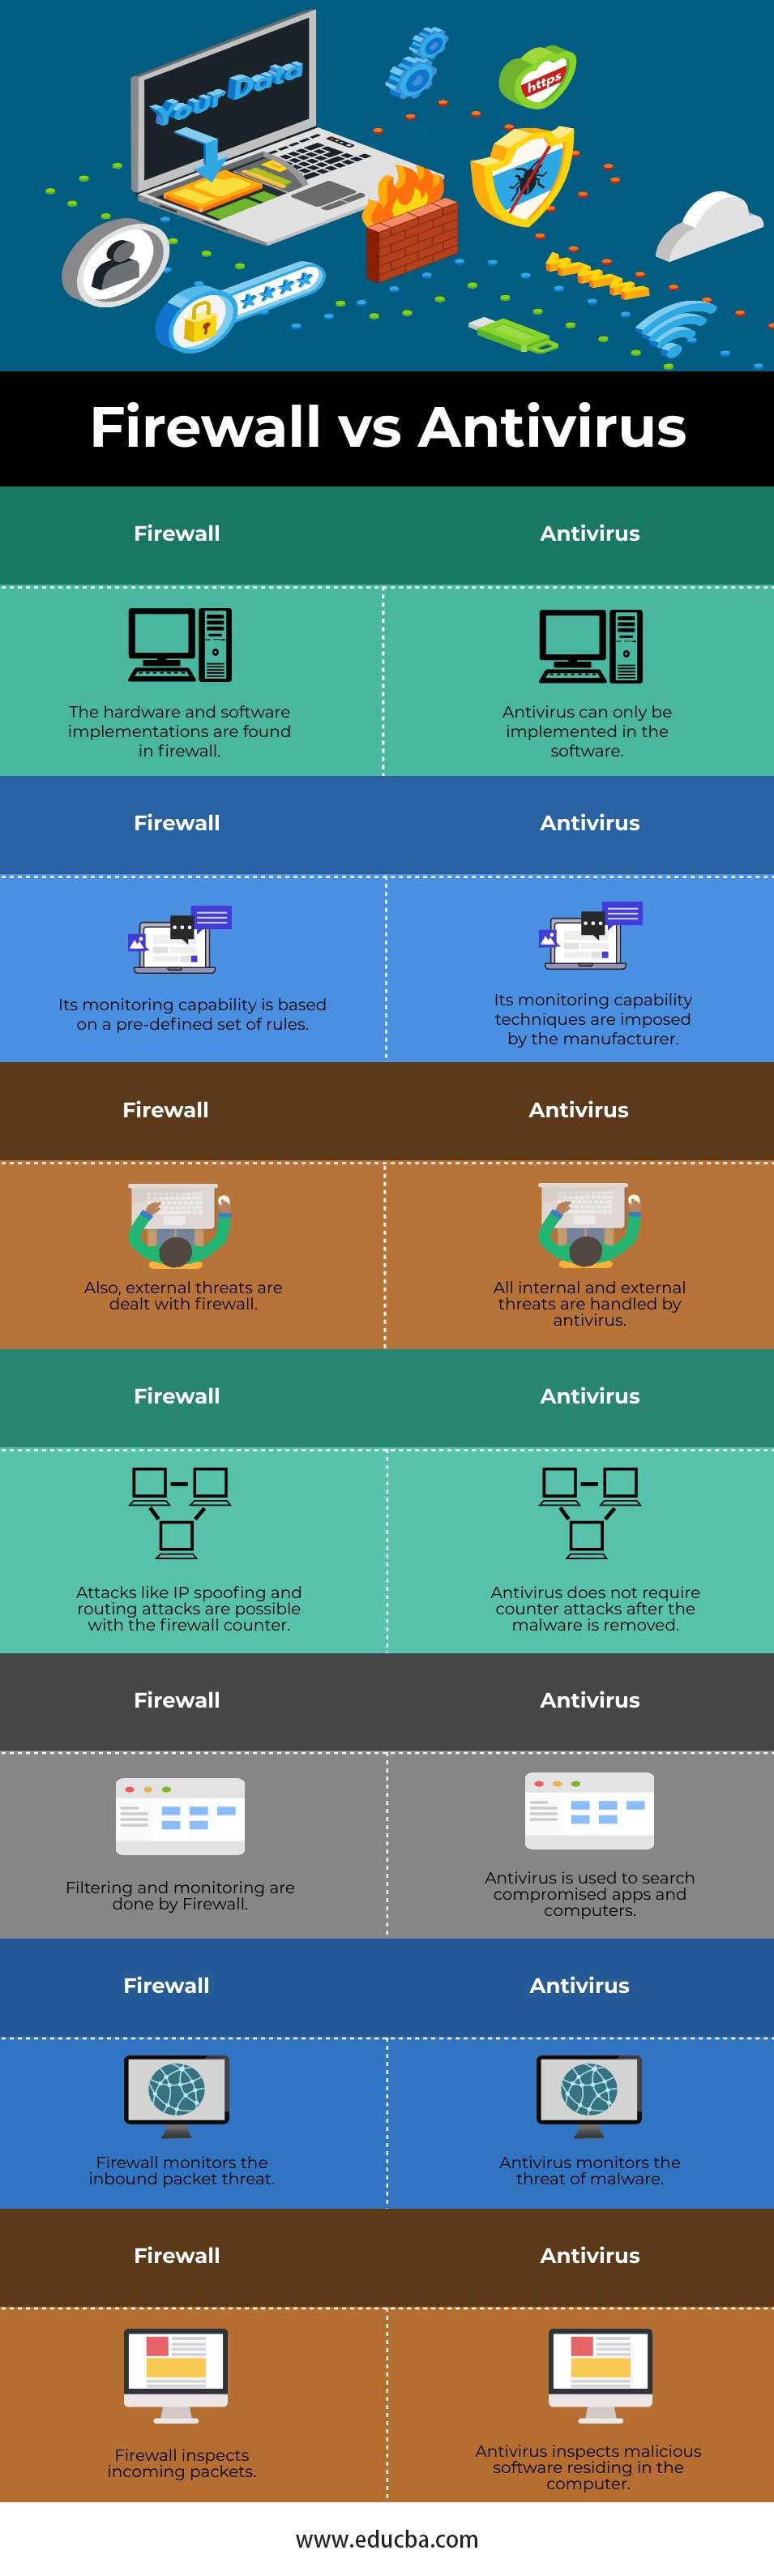 Firewall vs Antivirus Info